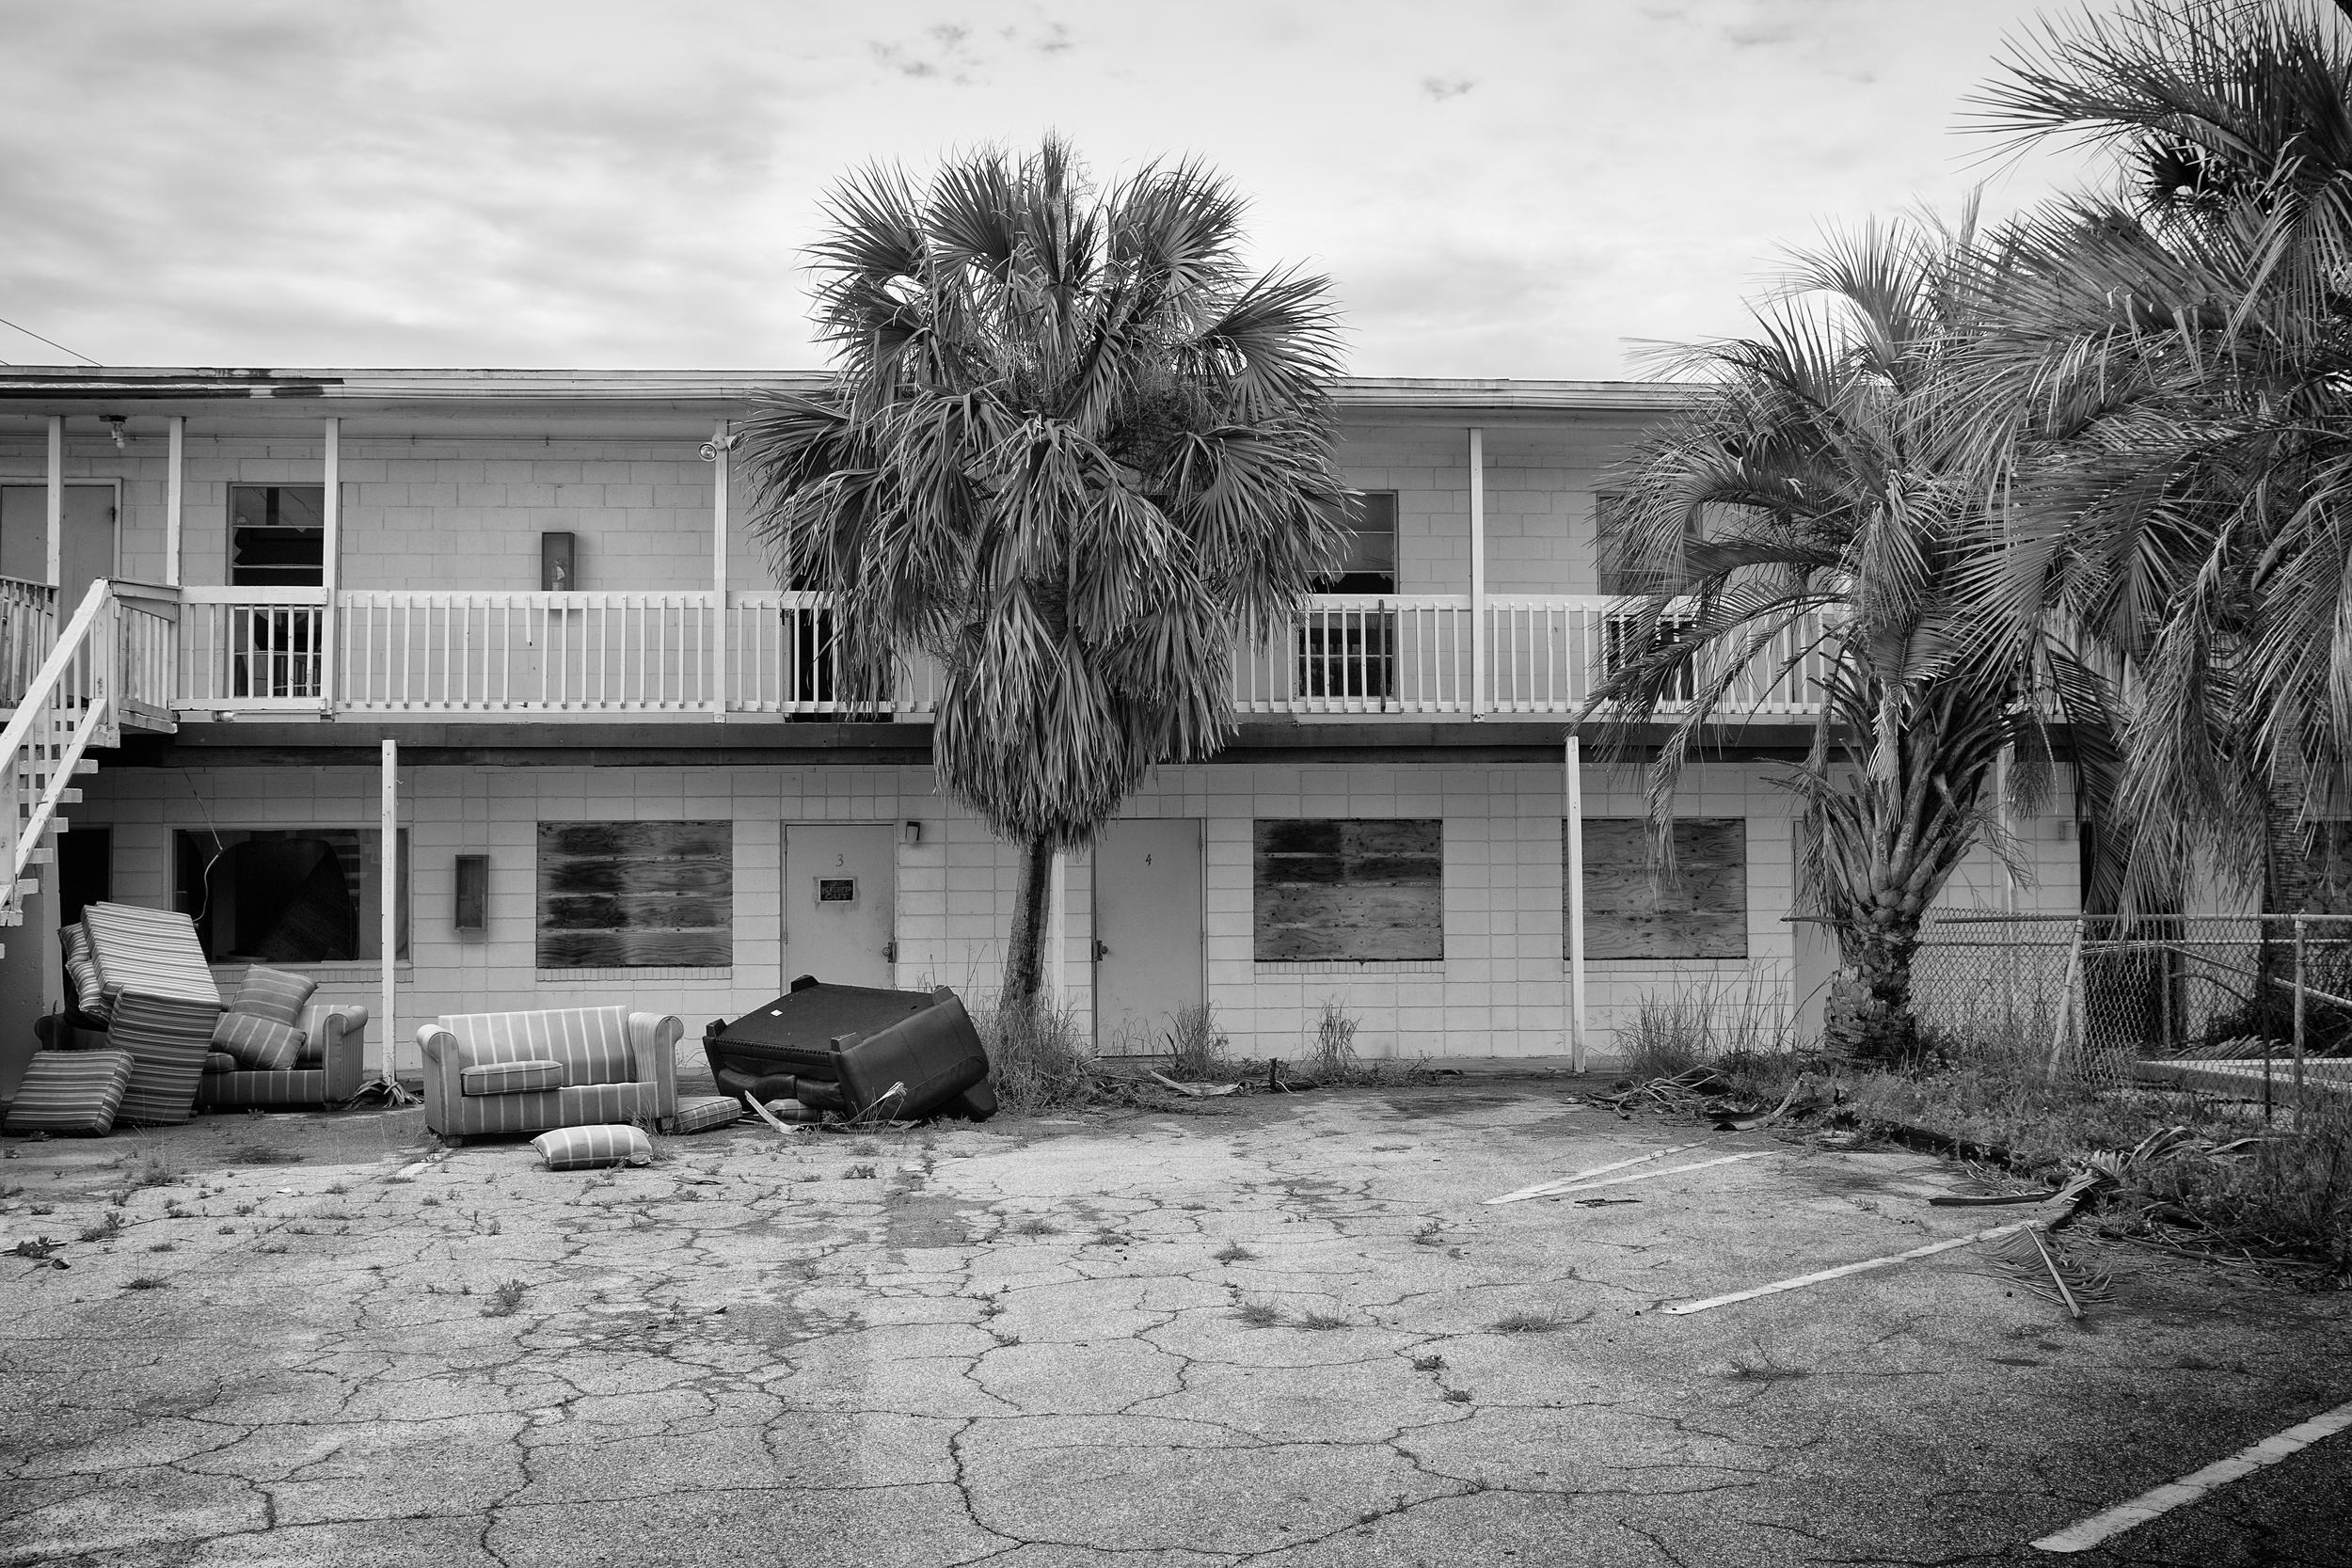 FL Motel Pool Empty (1 of 1).jpg